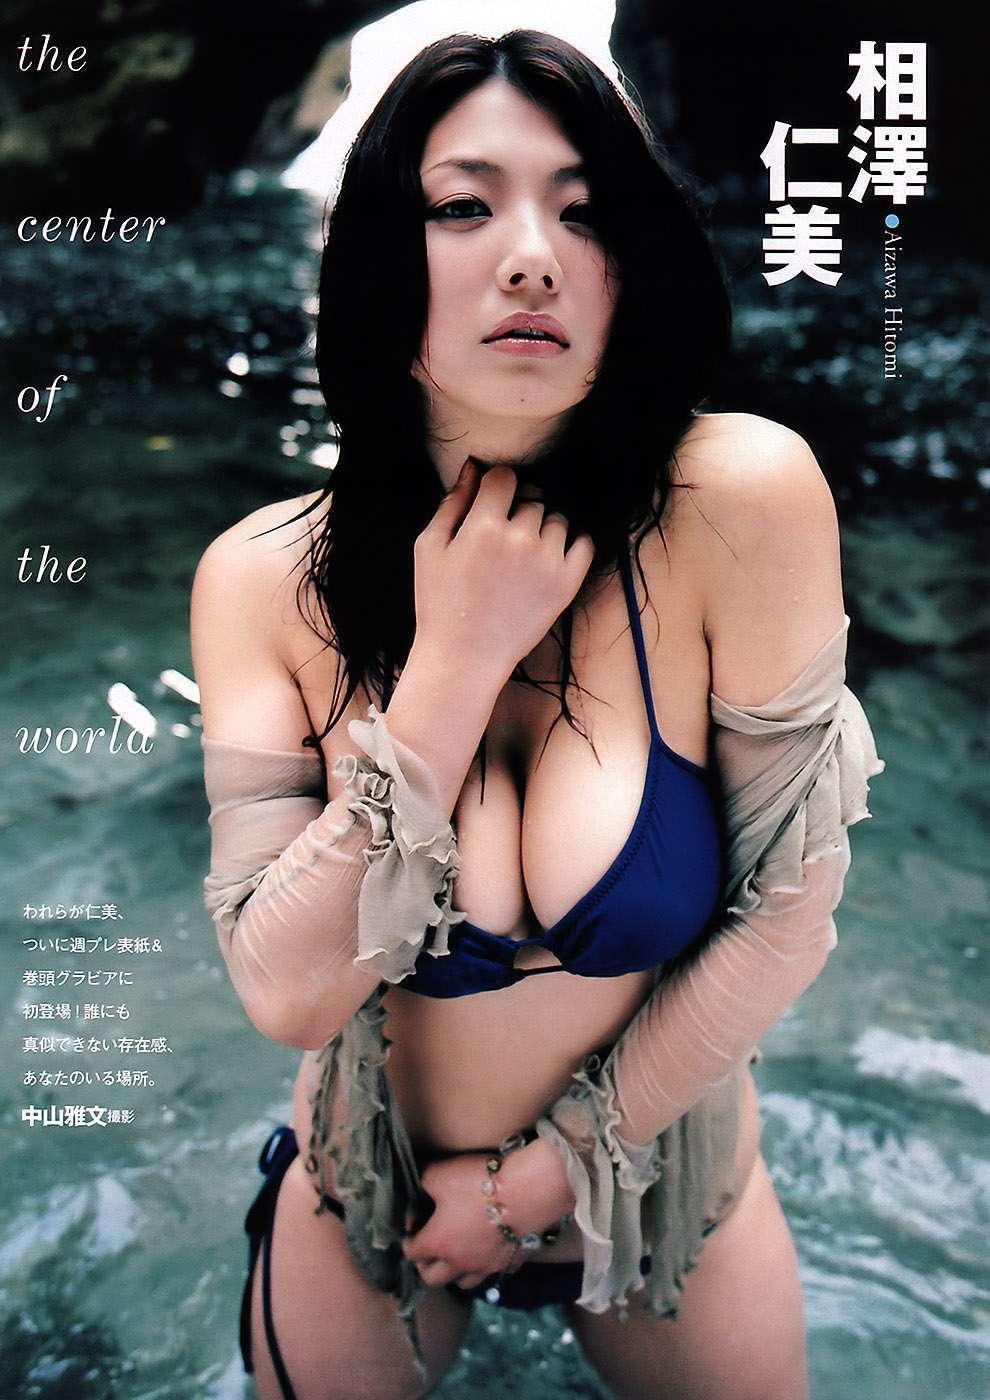 aizawa_hitomi201.jpg